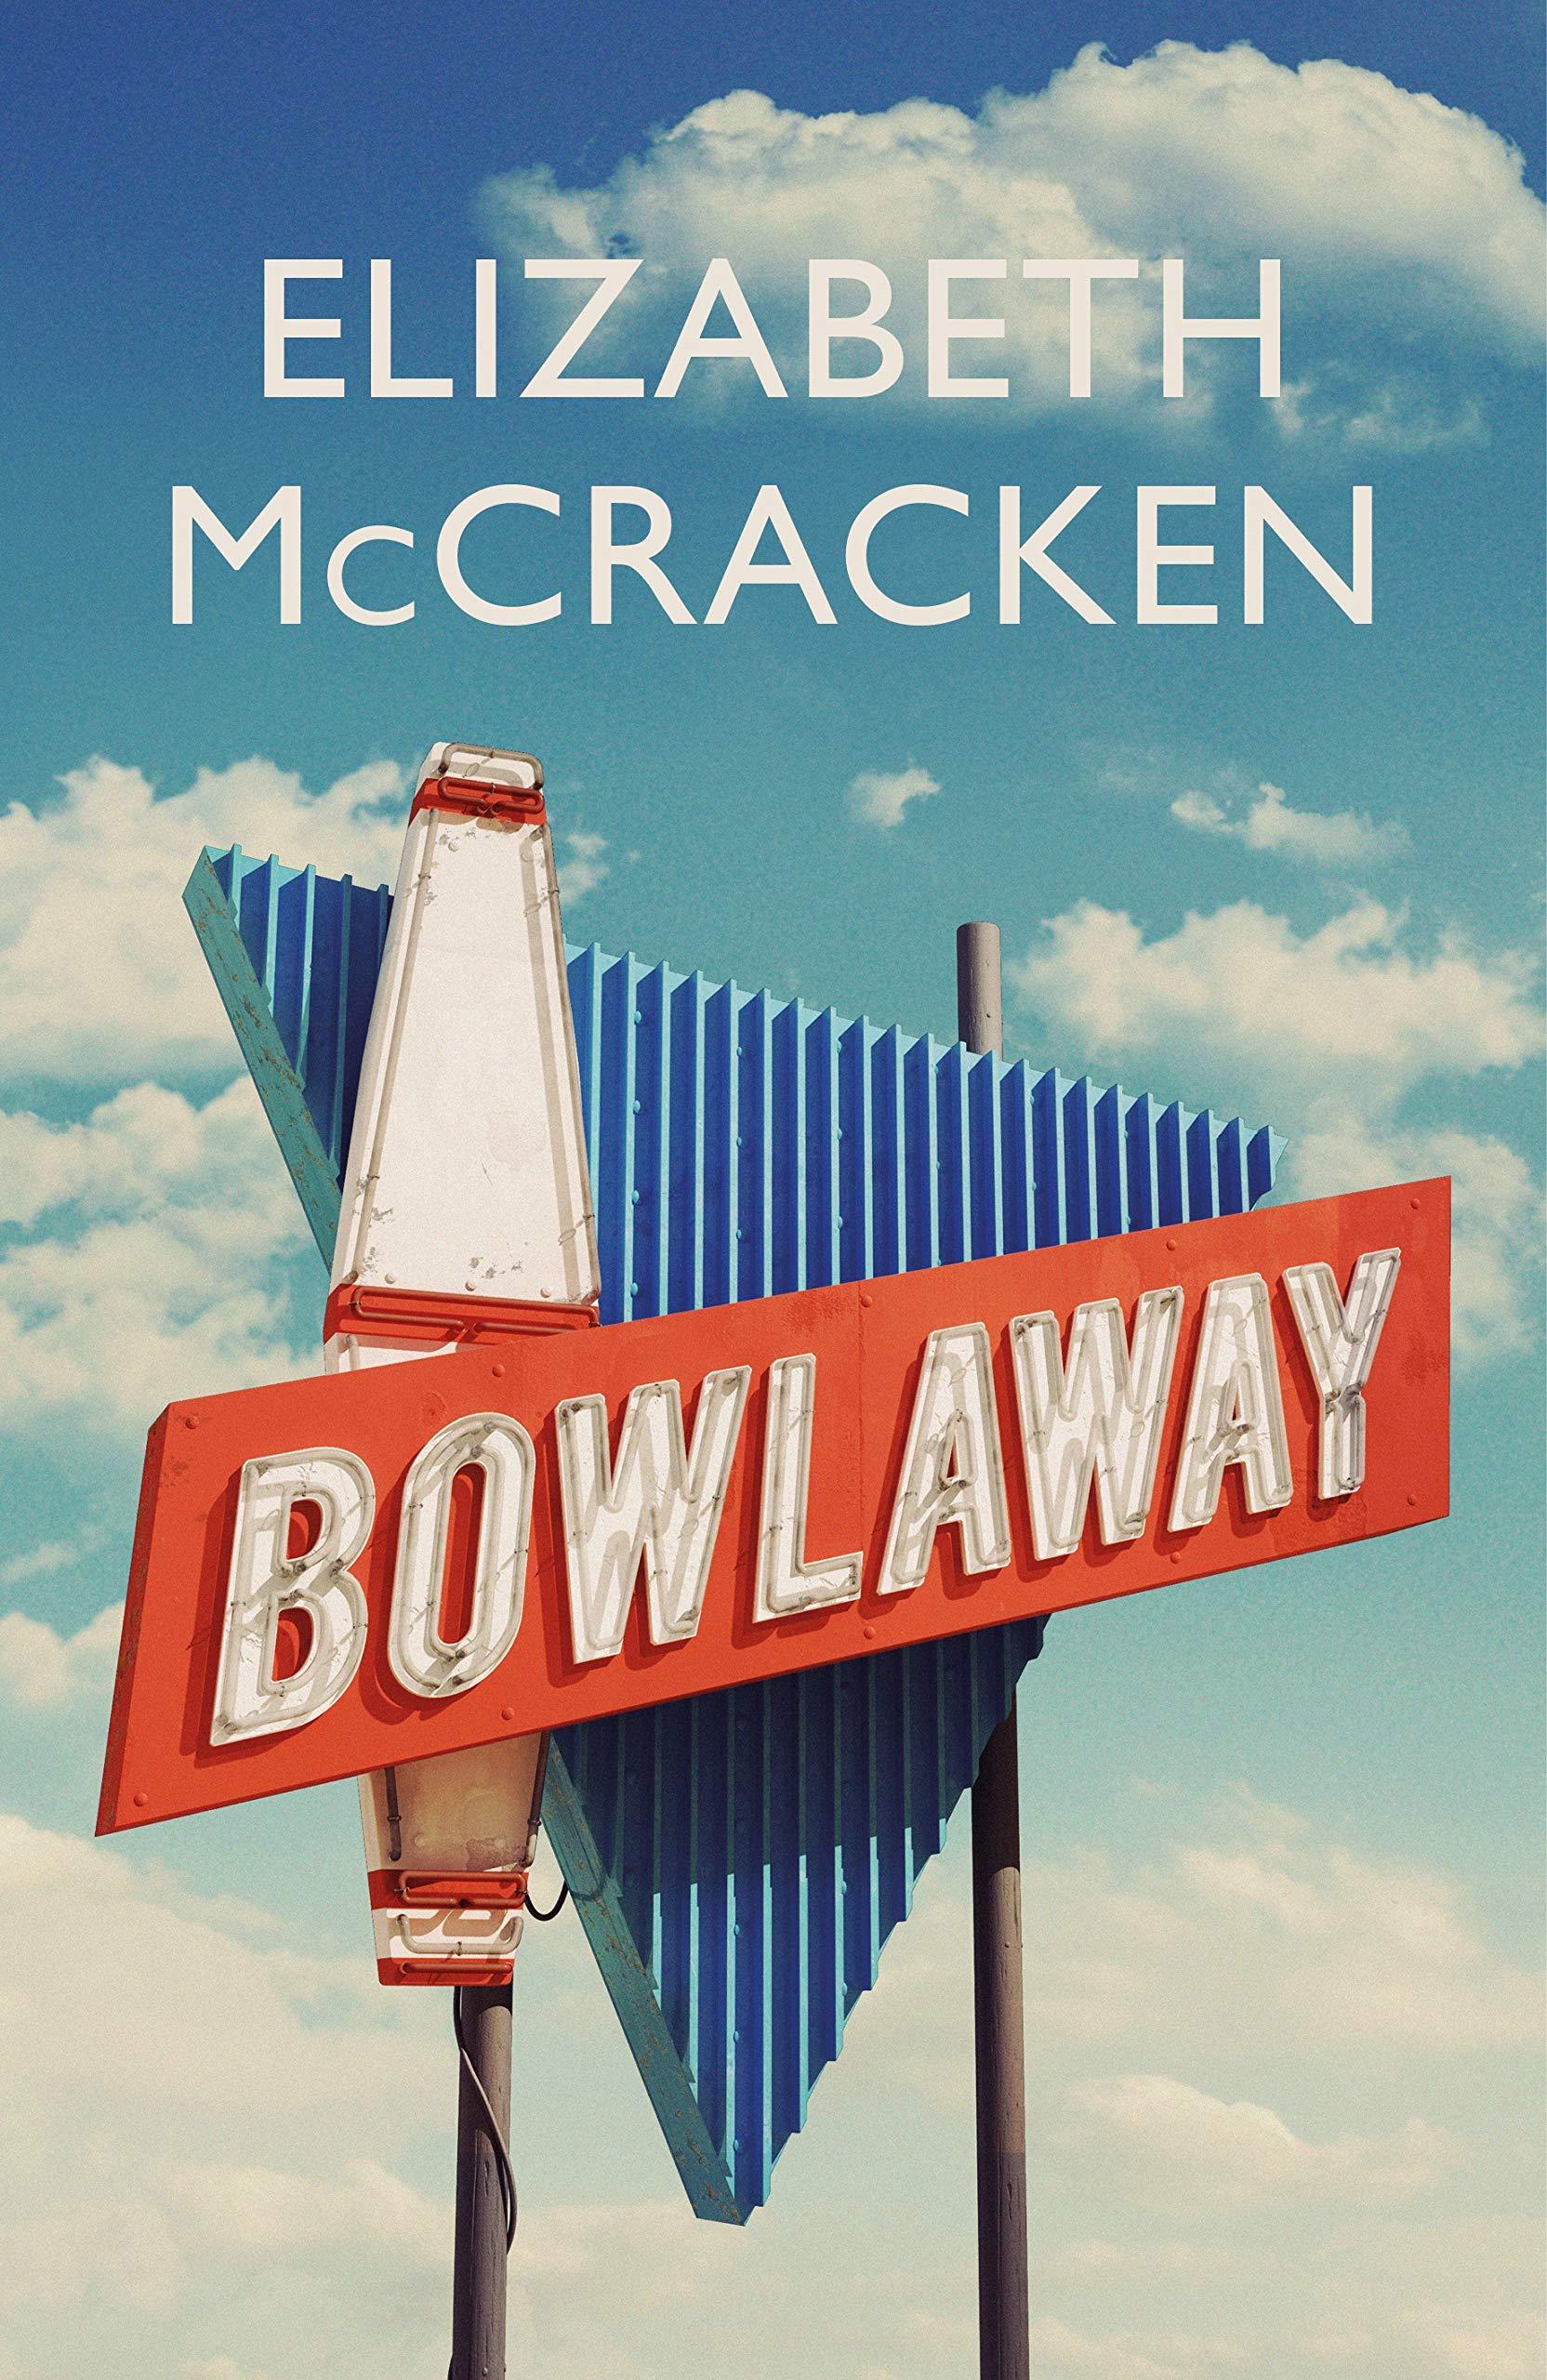 Bowlaway: Amazon co uk: Elizabeth McCracken: 9780224087117